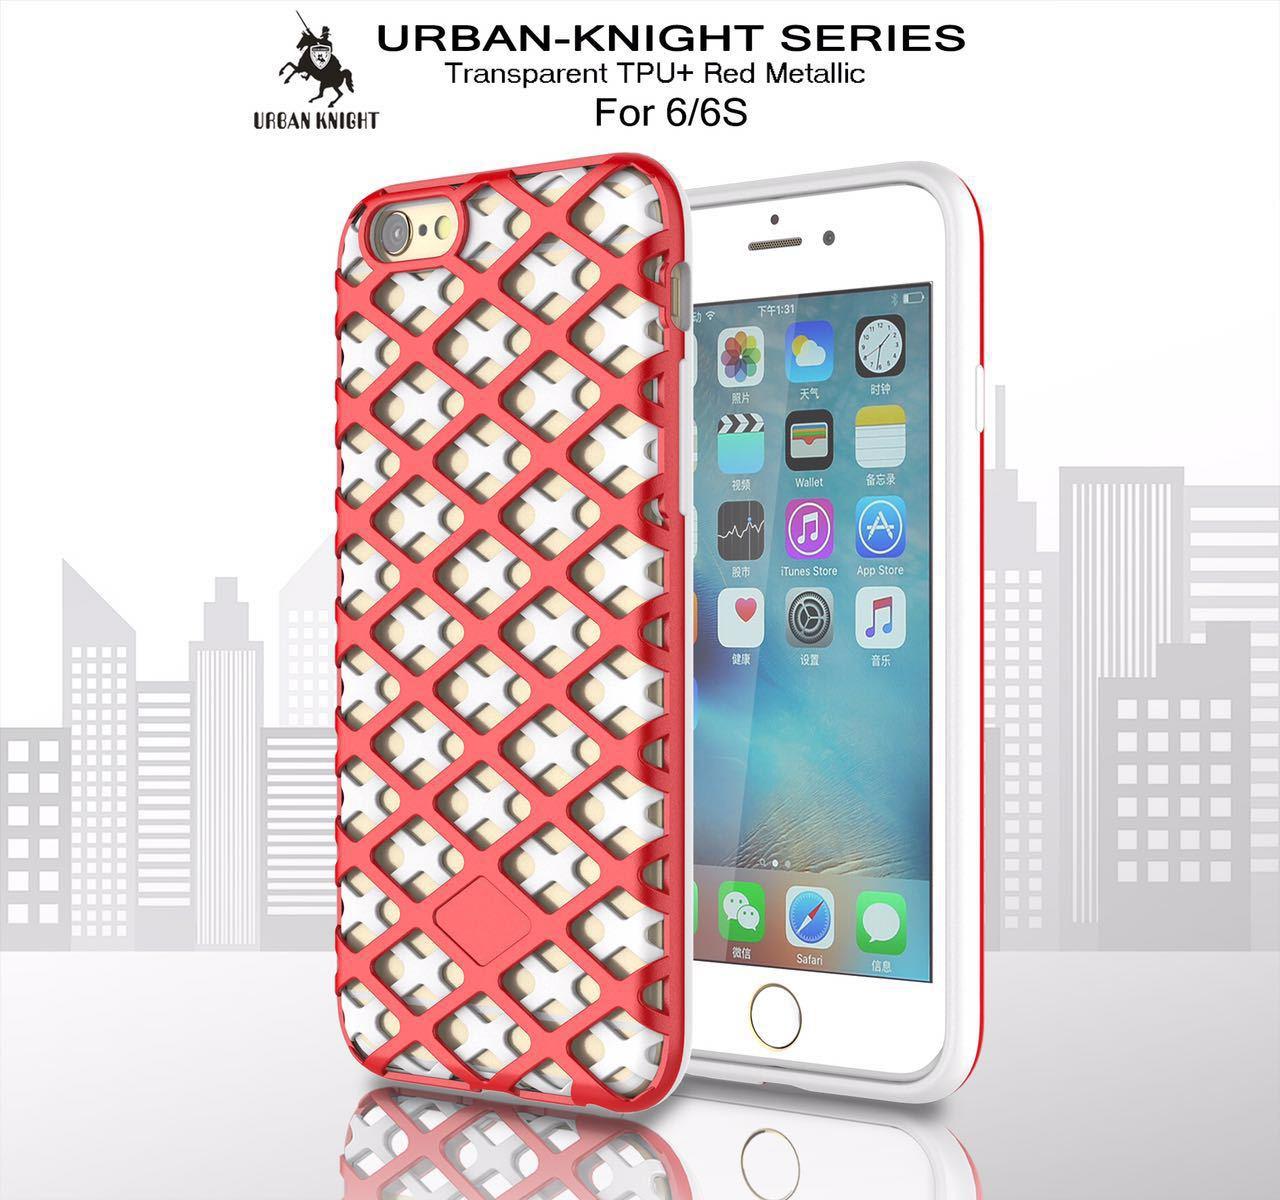 5se超薄iphone6splus散热外壳镂空网壳边框漆手机保护套苹果4.7寸pc+tpu手感iphone5图片